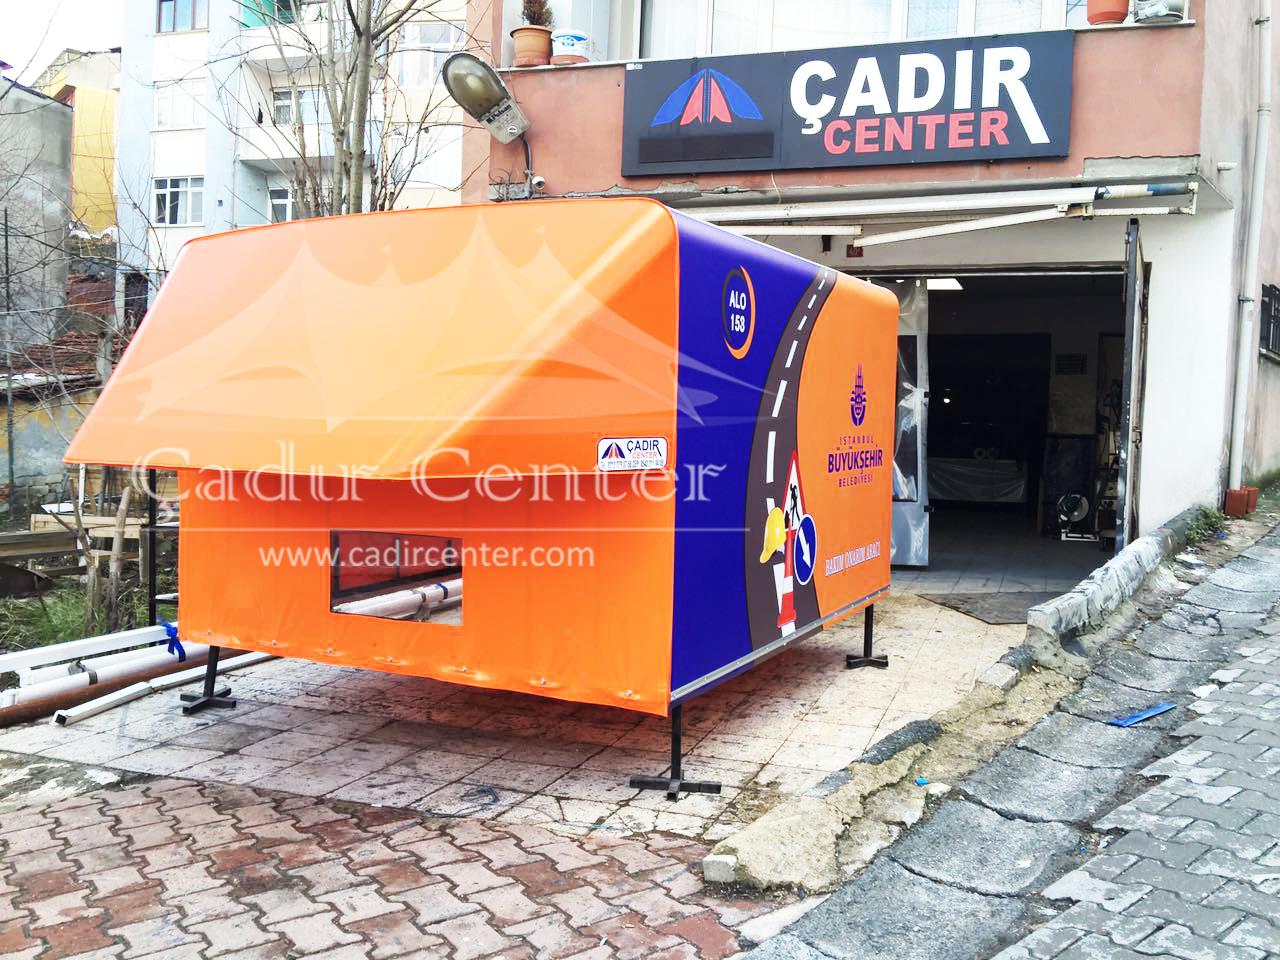 kamyonet-tente-7-çadır center - tenteci